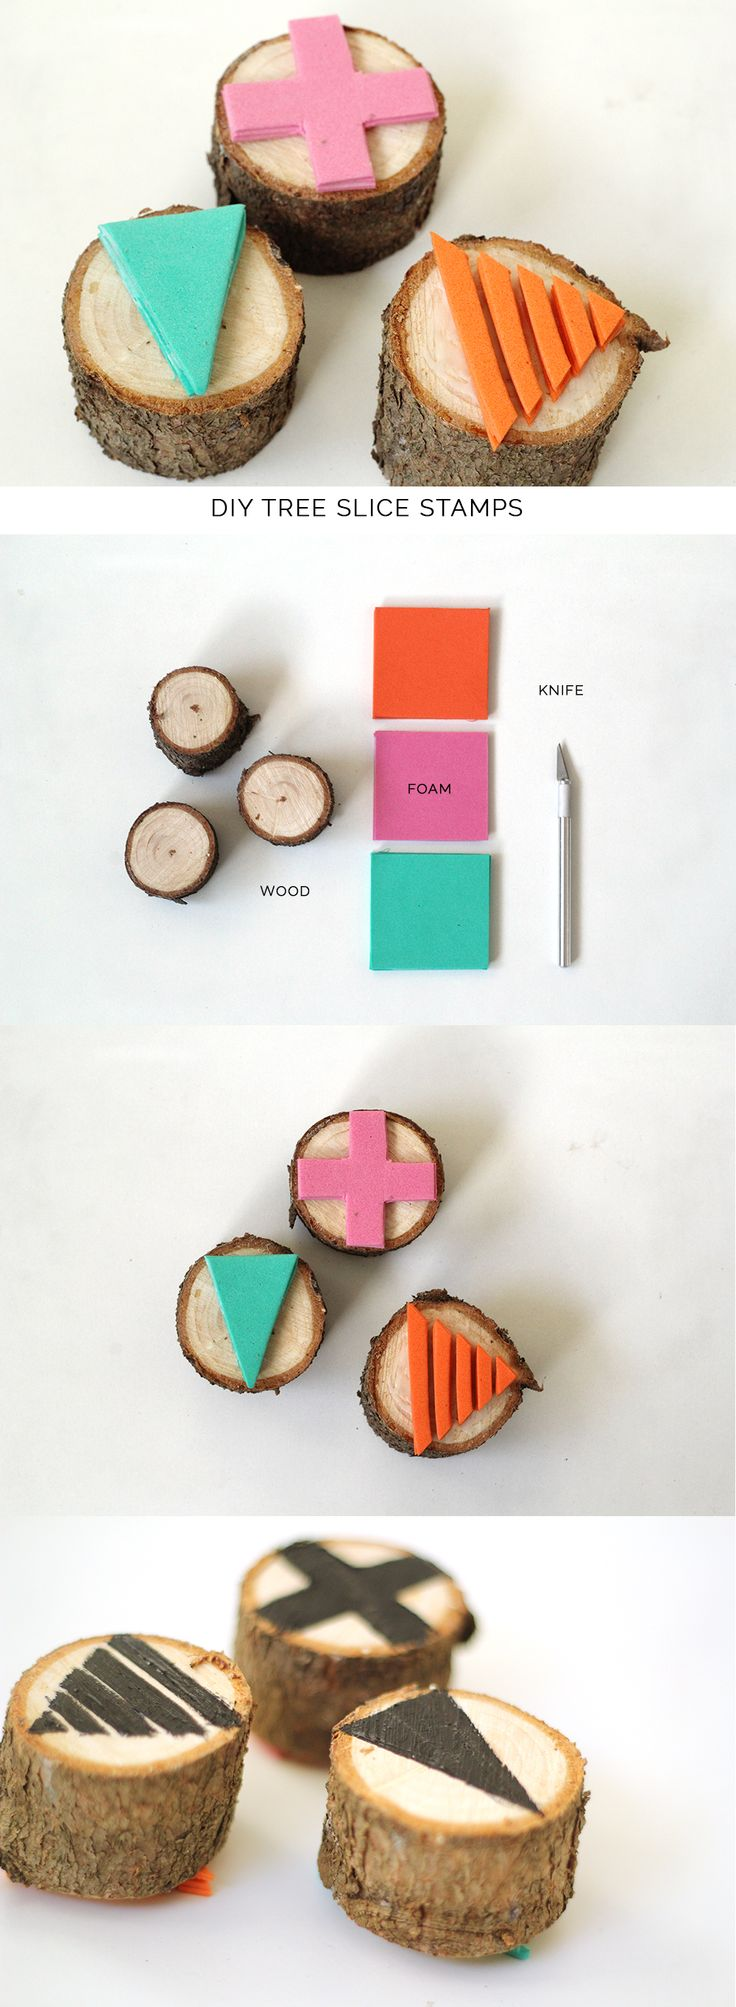 DIY Wood Slice Stamp